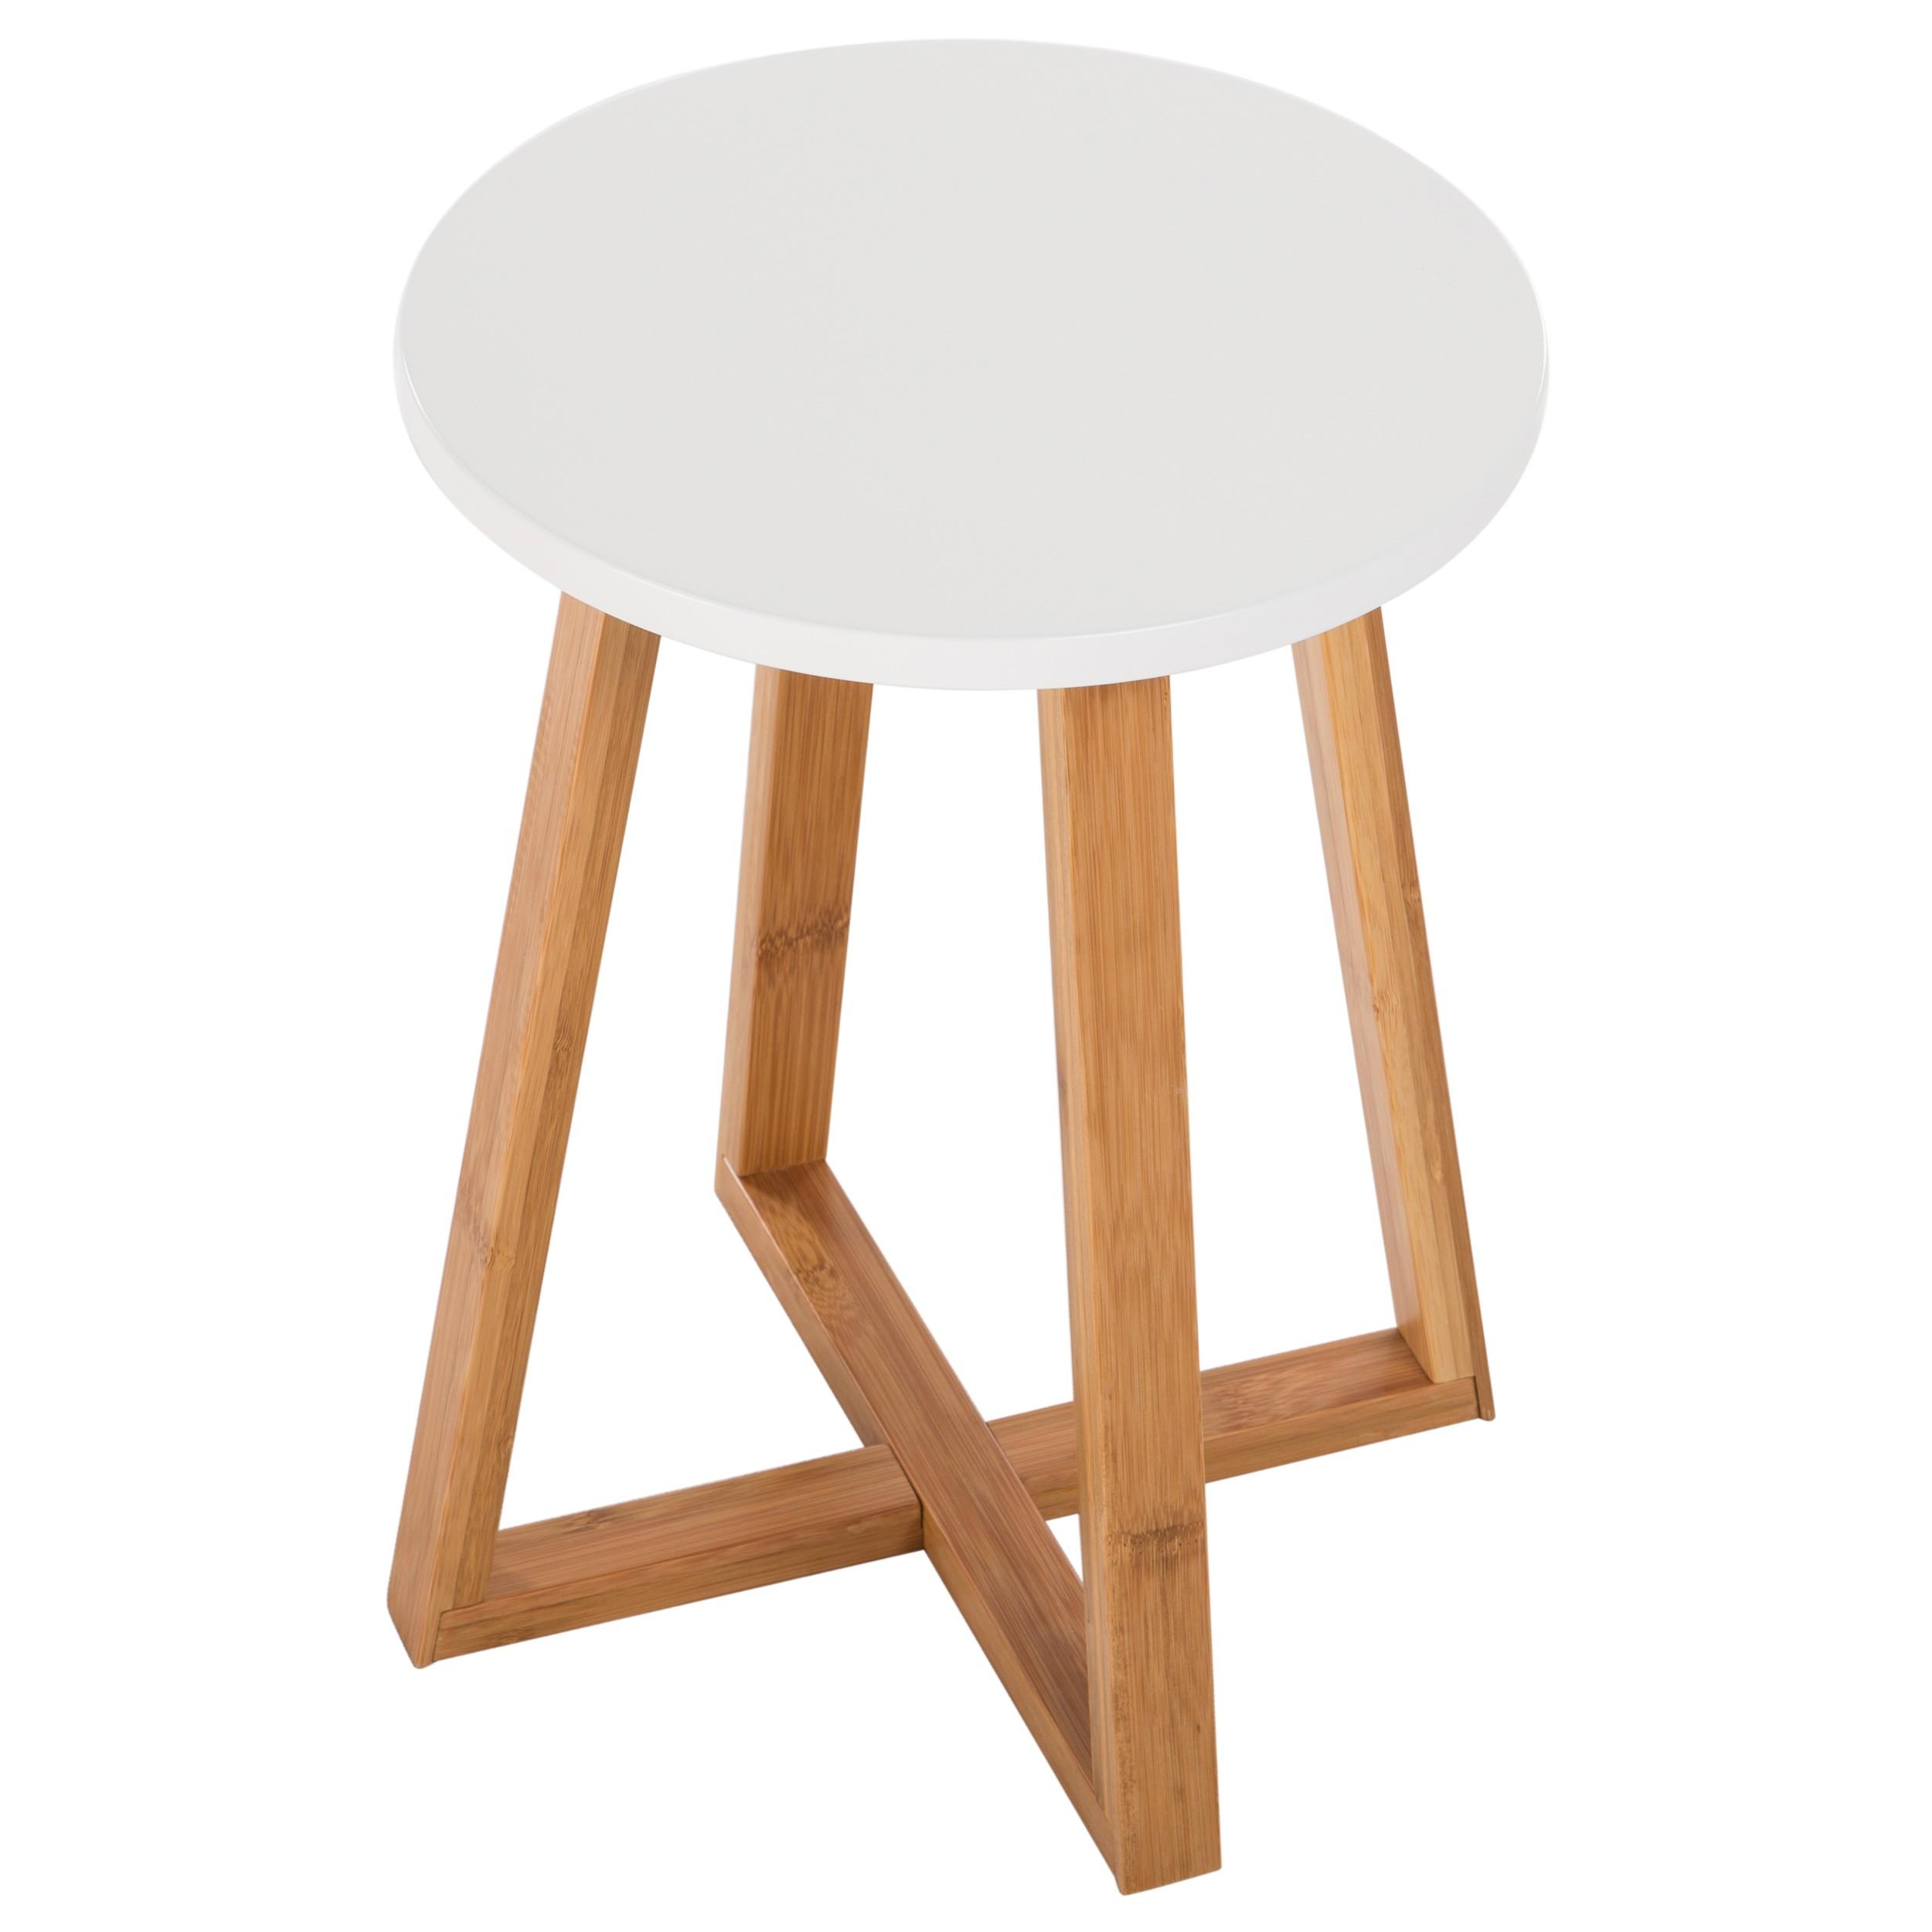 table d 39 appoint ronde skandi commandez nos tables d 39 appoint rondes skandi design rdv d co. Black Bedroom Furniture Sets. Home Design Ideas